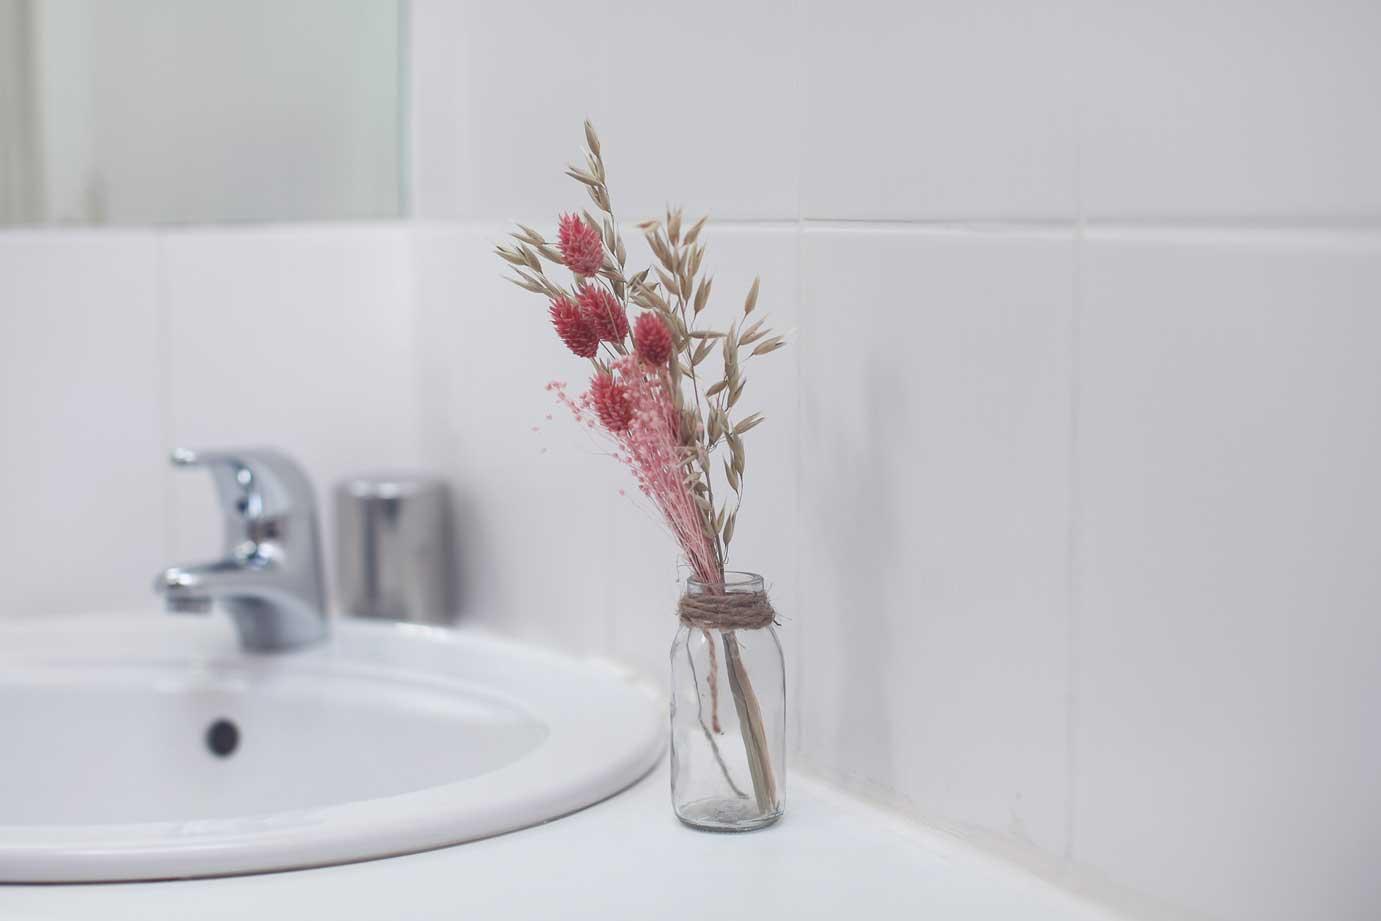 salle-de-bain-chambre-ecureuils-gite-la-hulotte-broceliande-bretagne